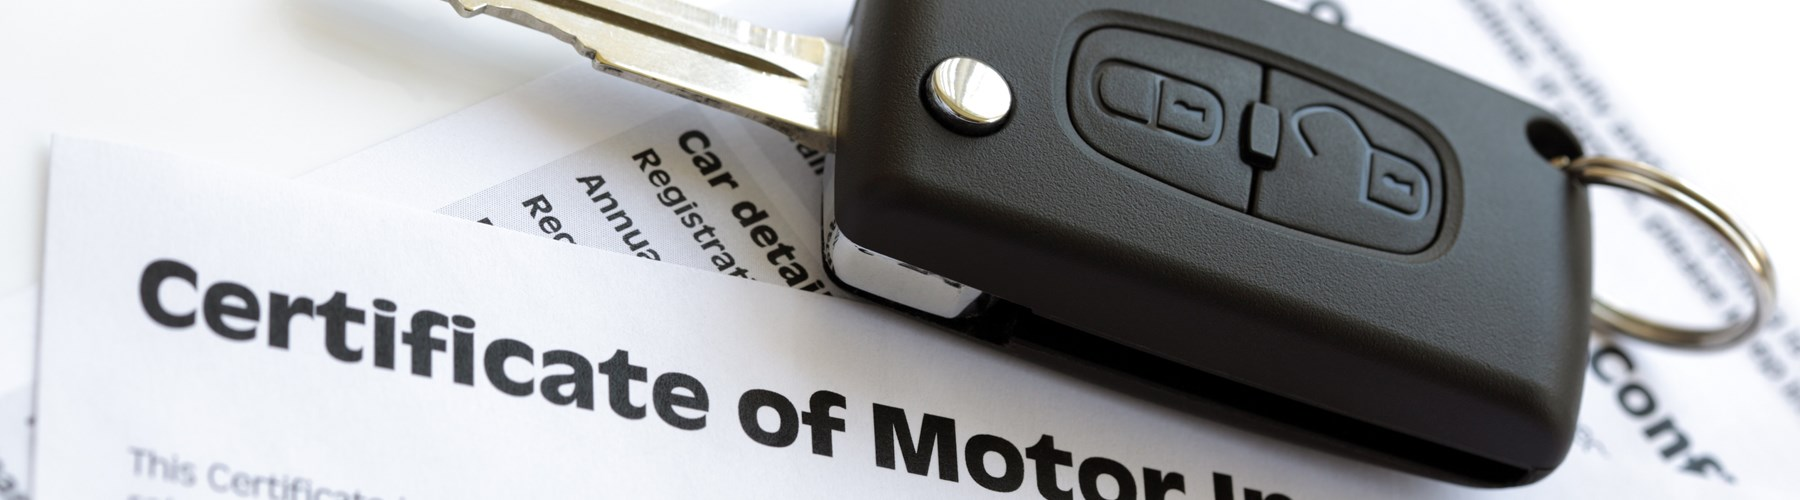 Car key on certificate of motor insurance